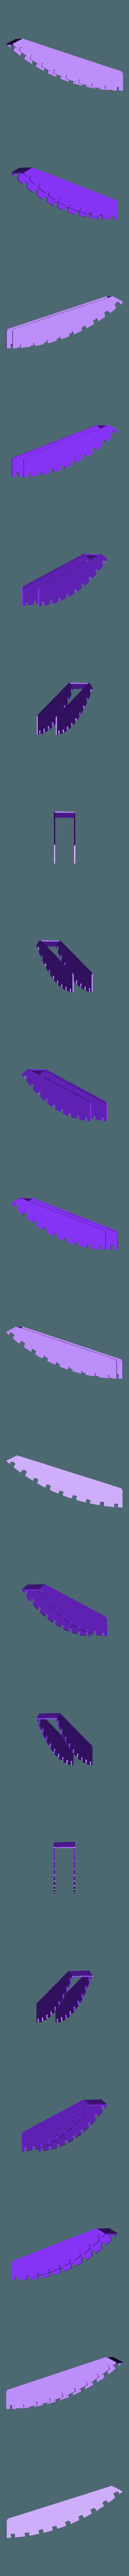 3.stl Download free STL file Deagostini Millennium Falcon Engine Exhaust SOLO version • 3D print object, boryelwoc